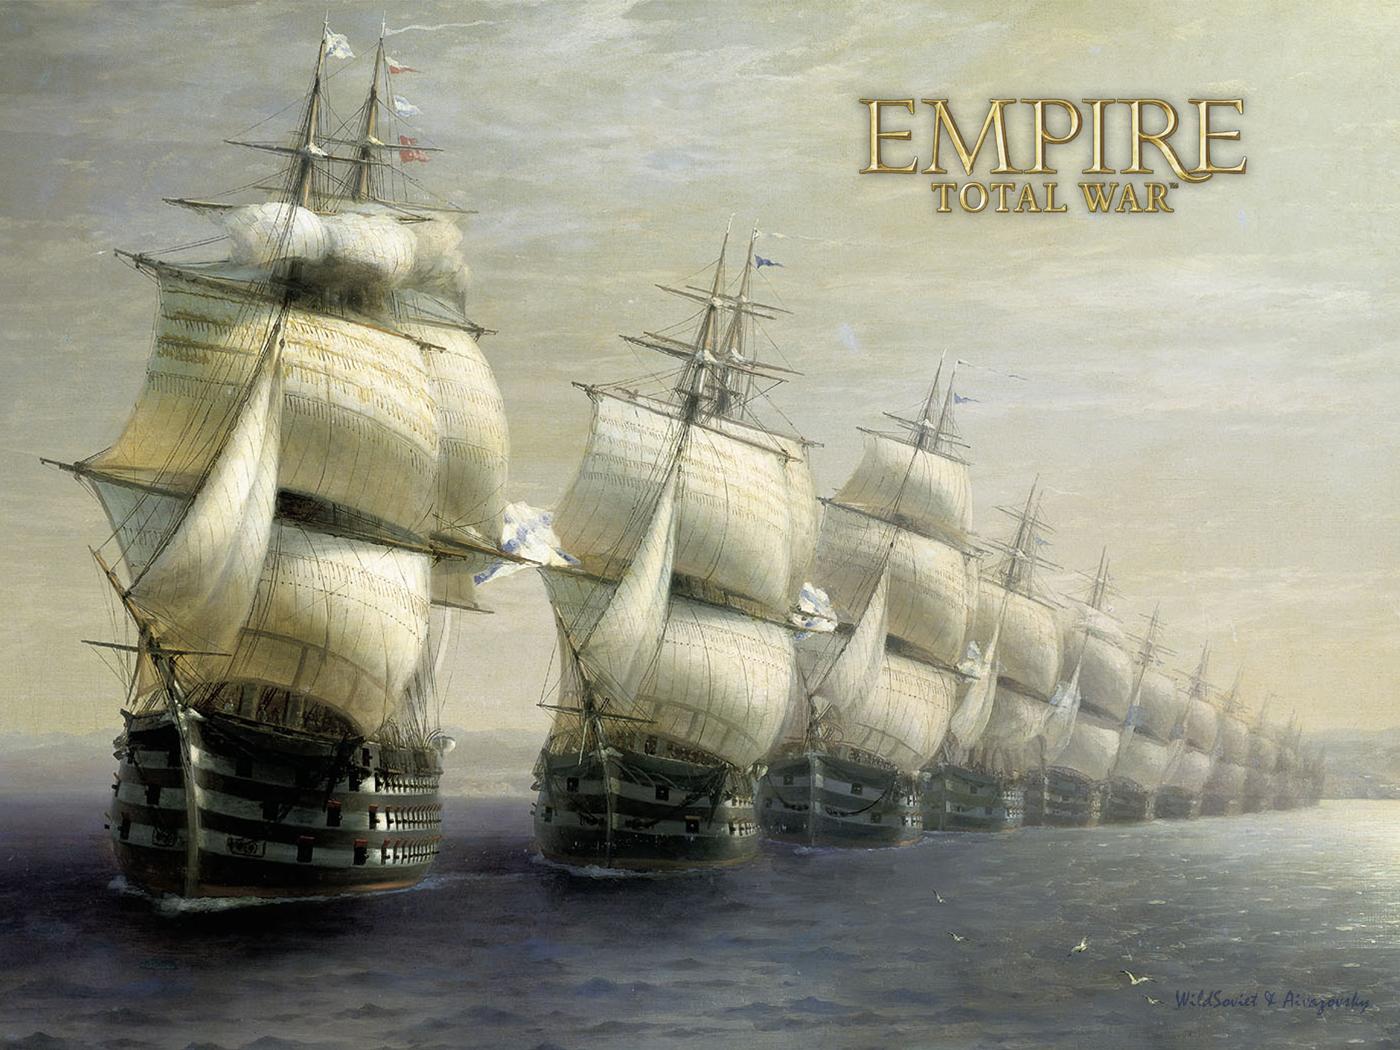 EmpireTotal War 1400x1050